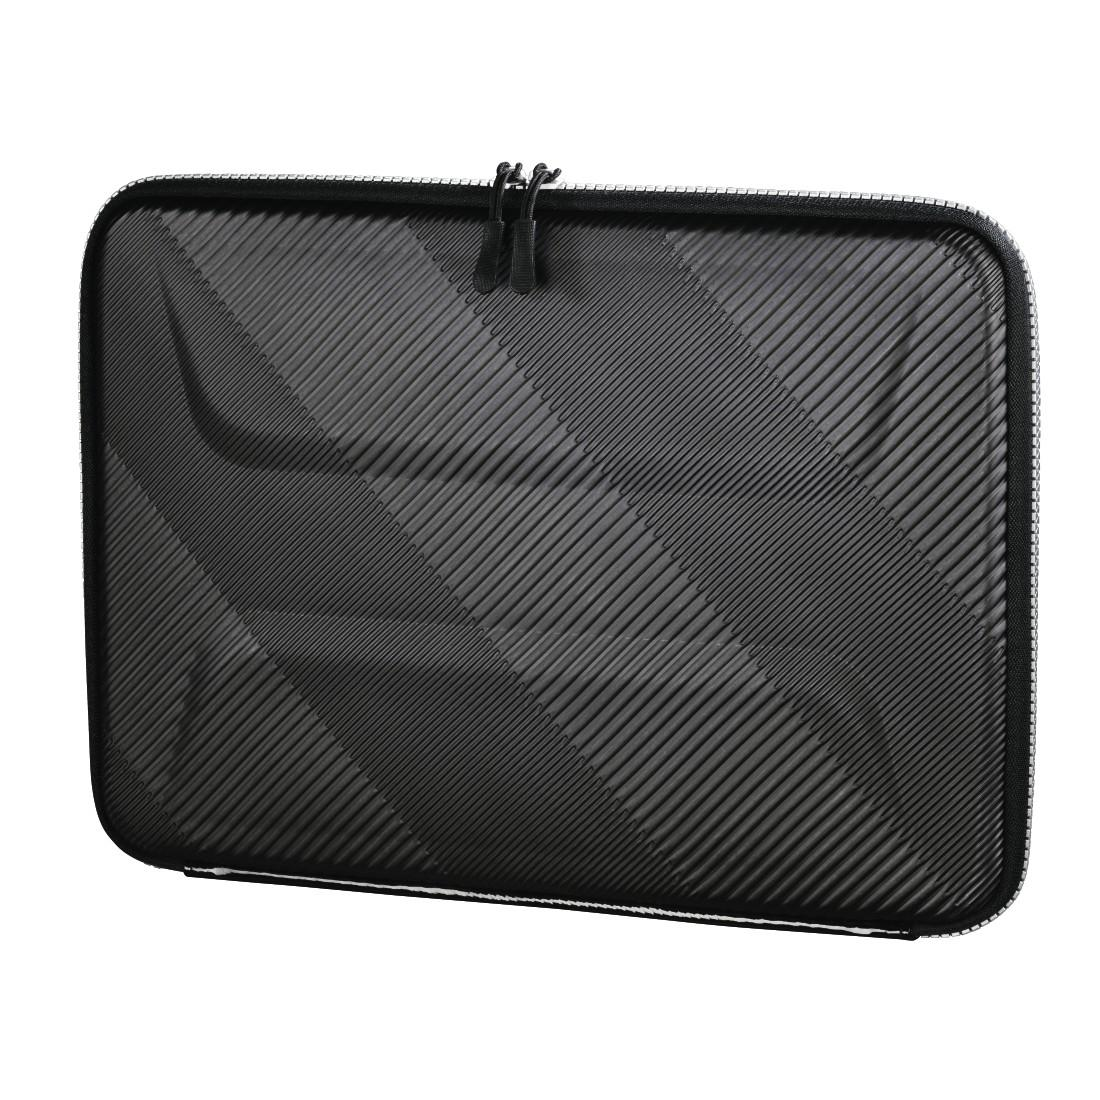 Универсален калъф за лаптоп HAMA Protection, до 34 см  (13.3),  удароустойчив, пластмасов, Черен